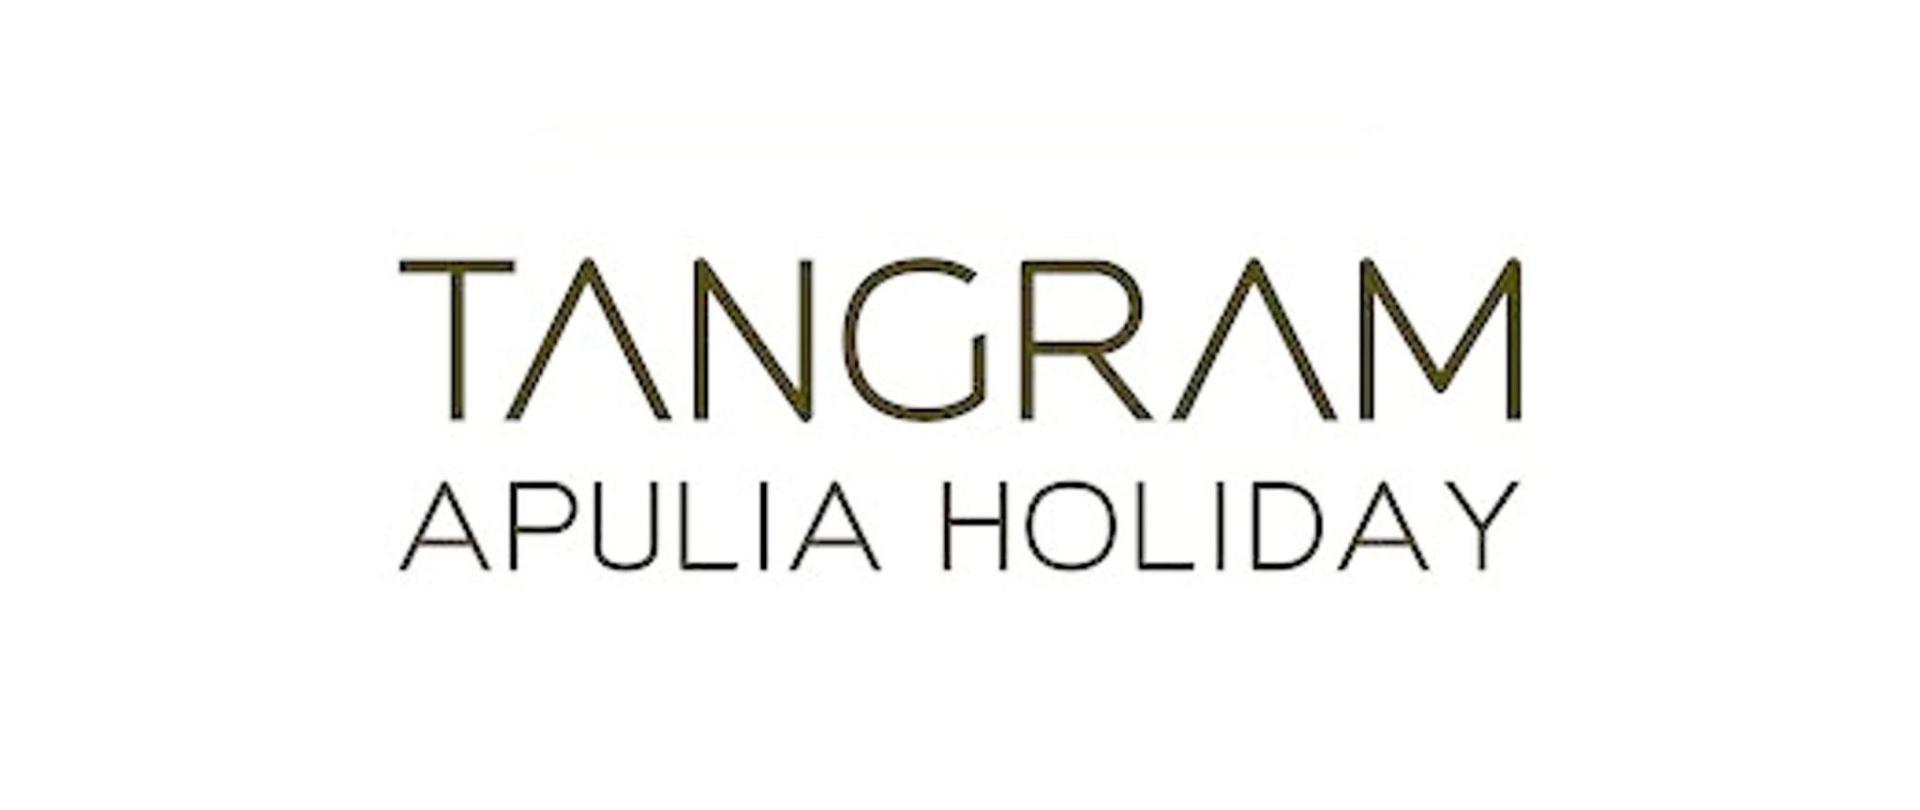 Tangram Scritta logo 2048x1536.jpg